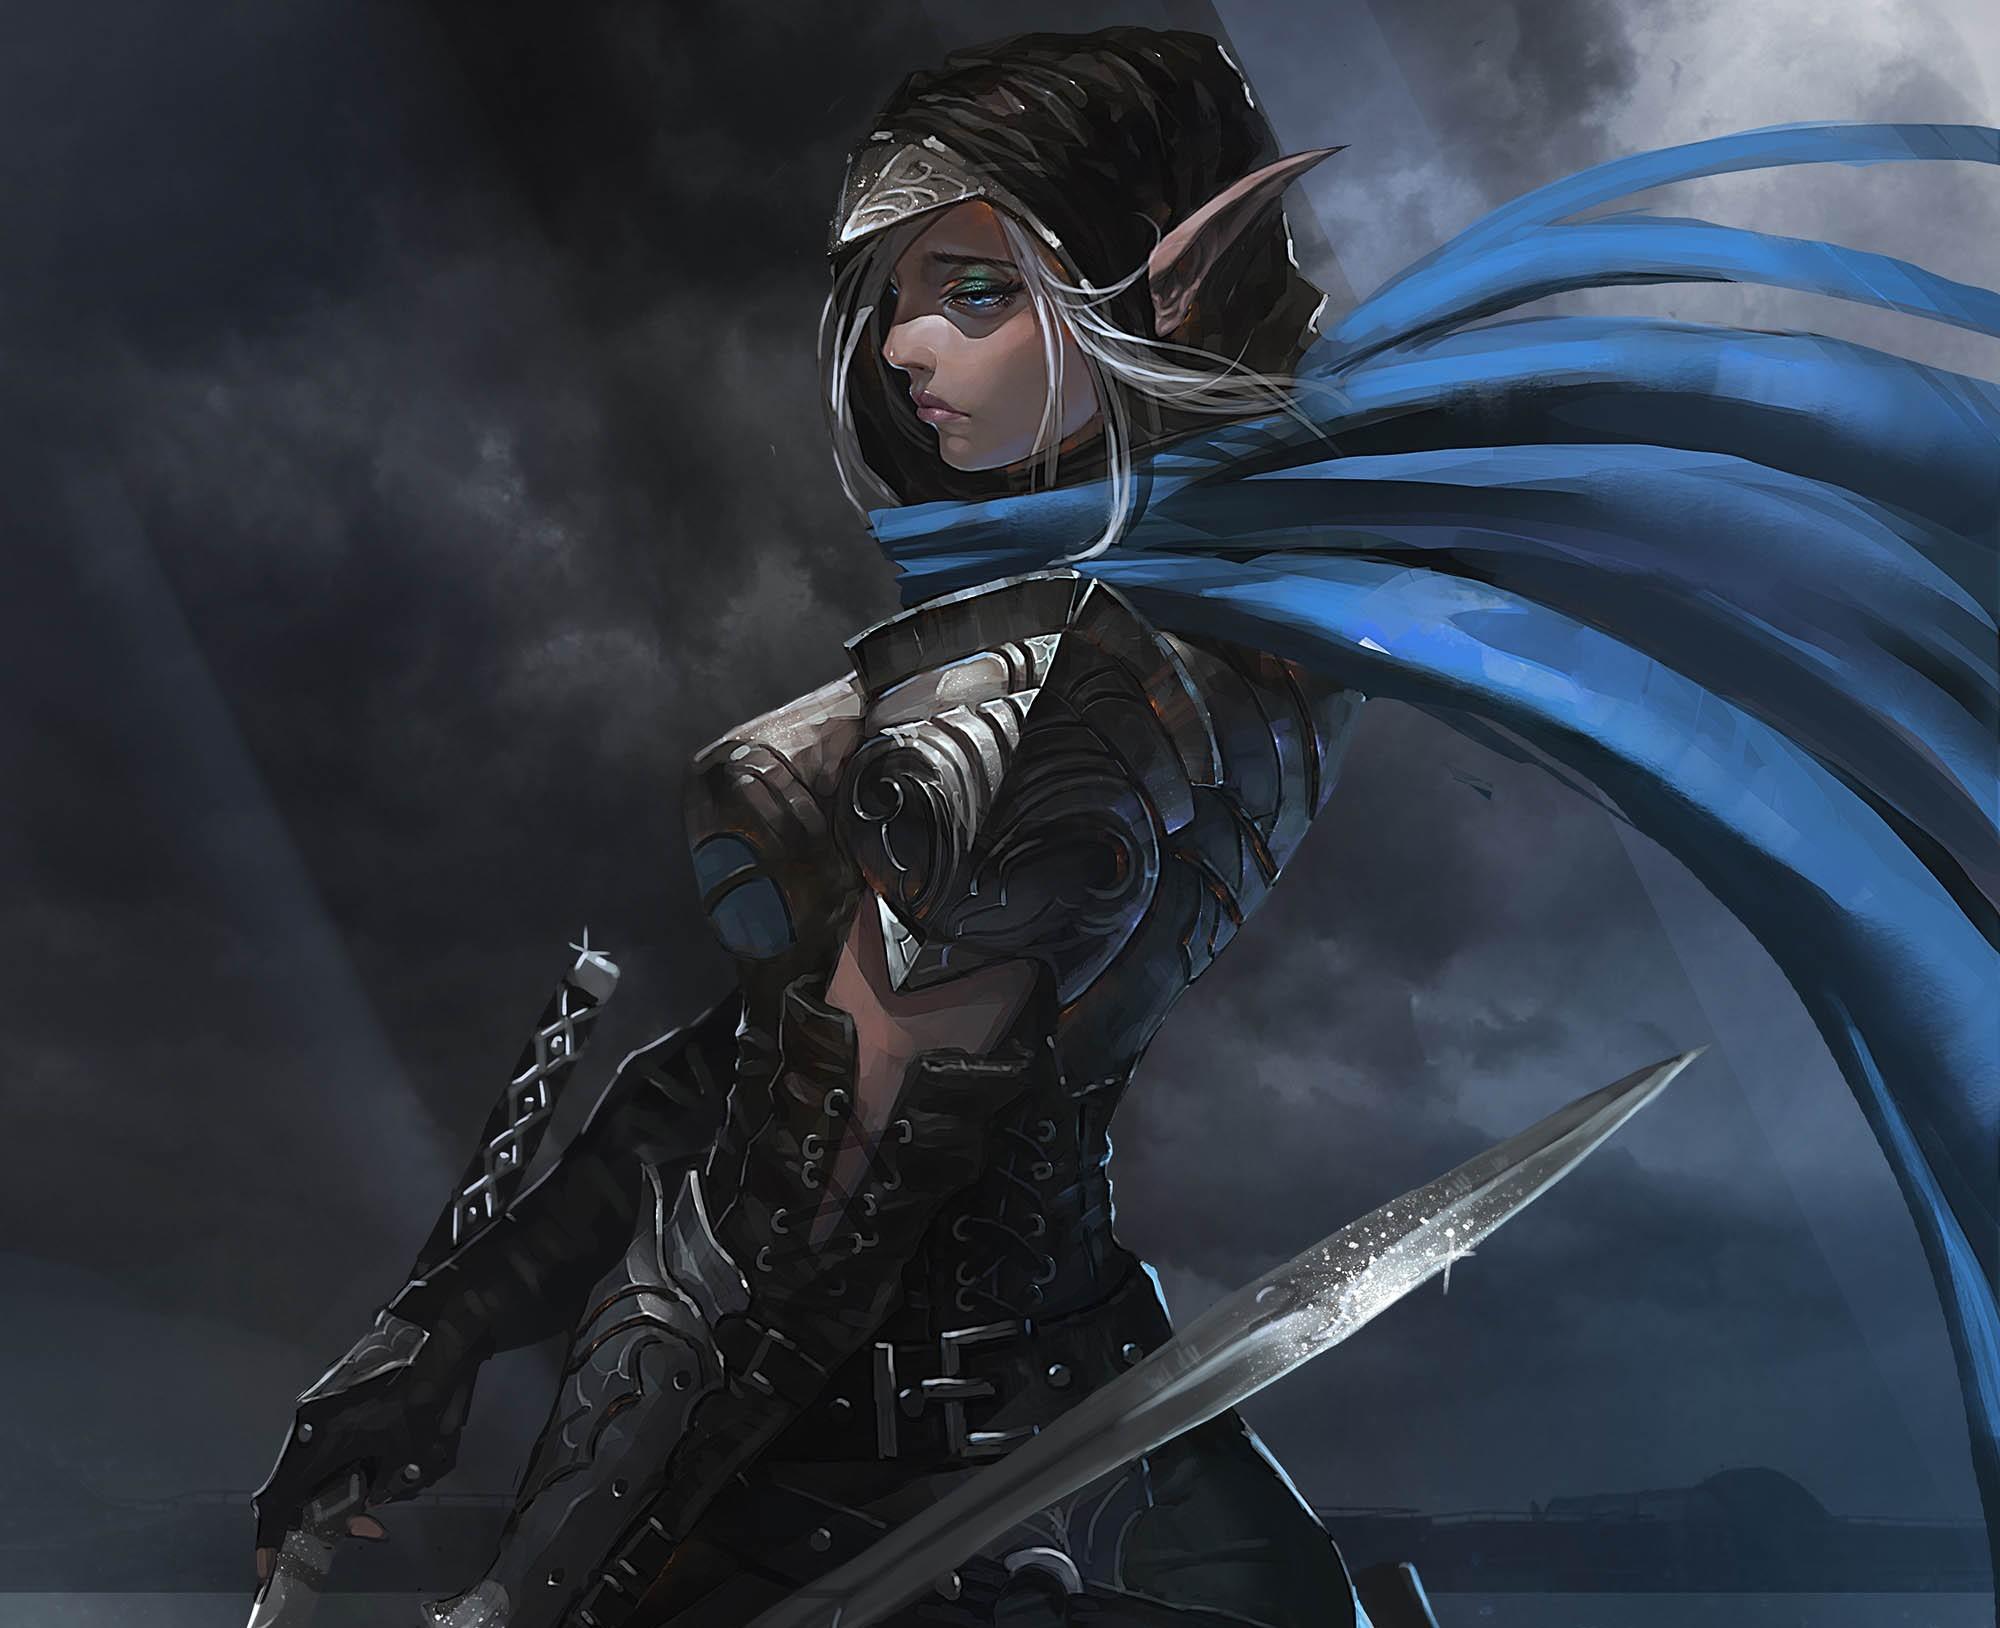 Fantasy Art Elves Wallpapers Hd Desktop And Mobile: Wallpaper : Girl, Elf, Fantasy, Armor, Sword 2000x1628